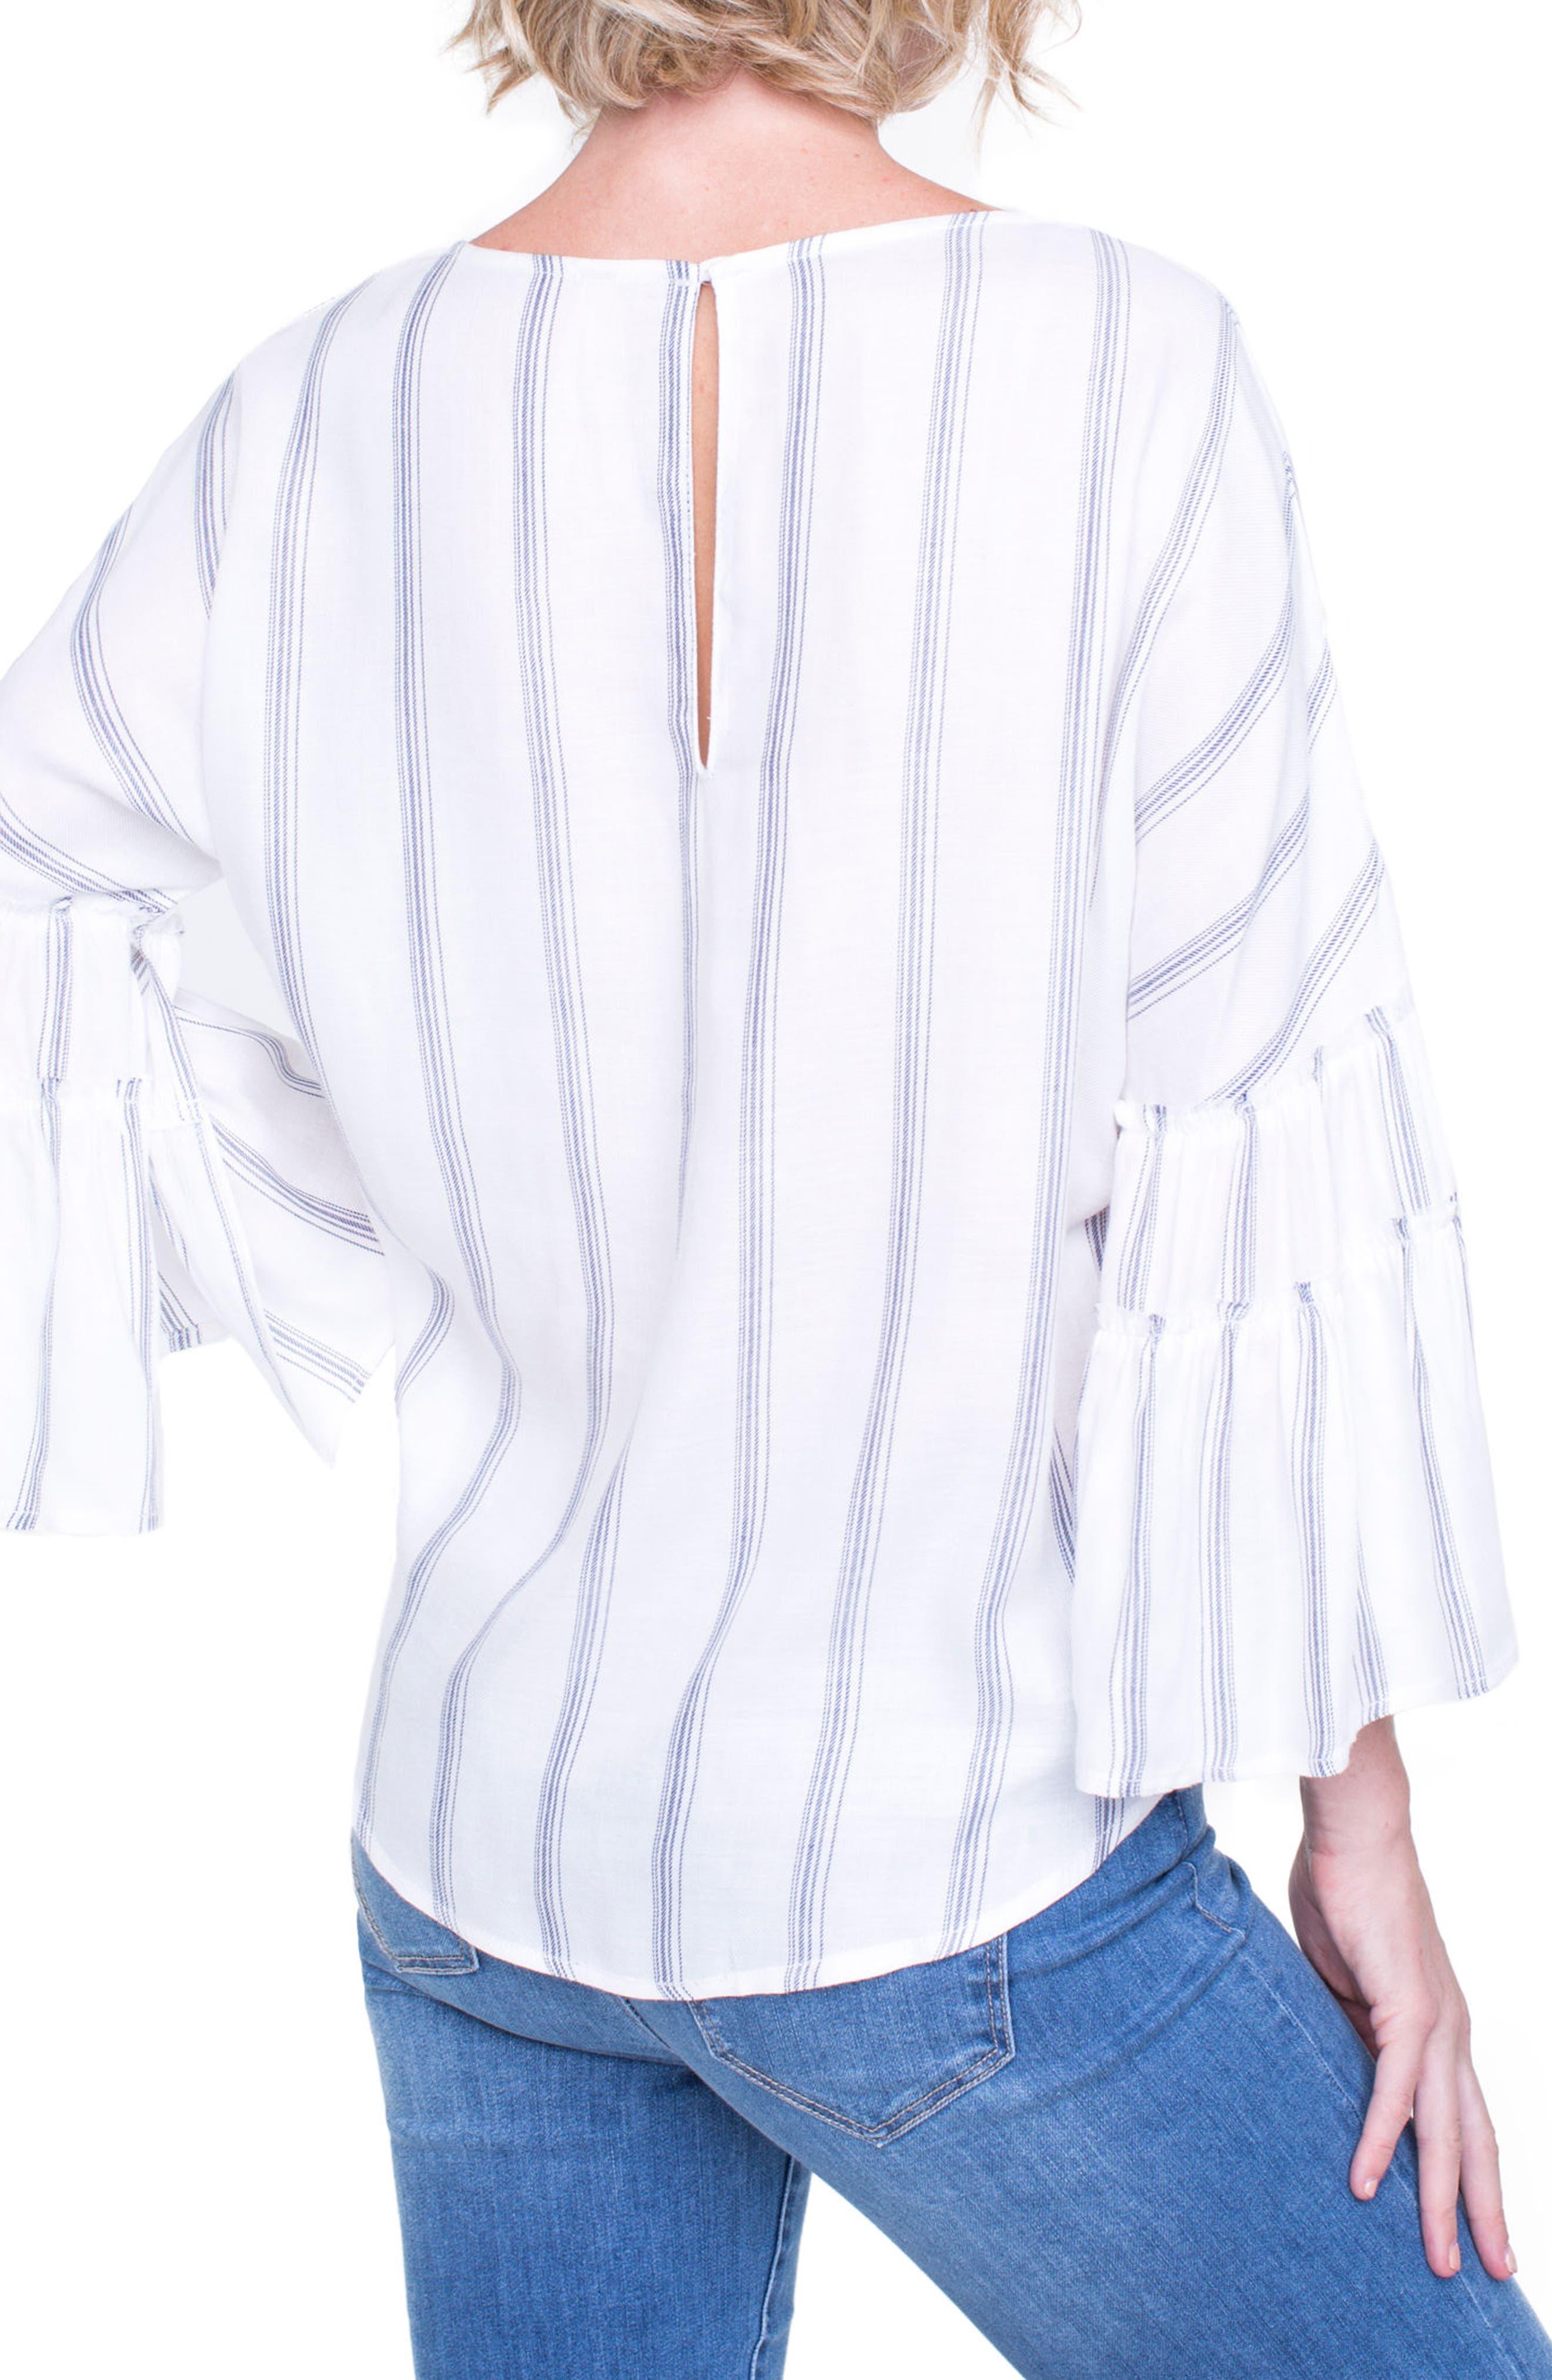 Voluminous Sleeve Shirt,                             Alternate thumbnail 3, color,